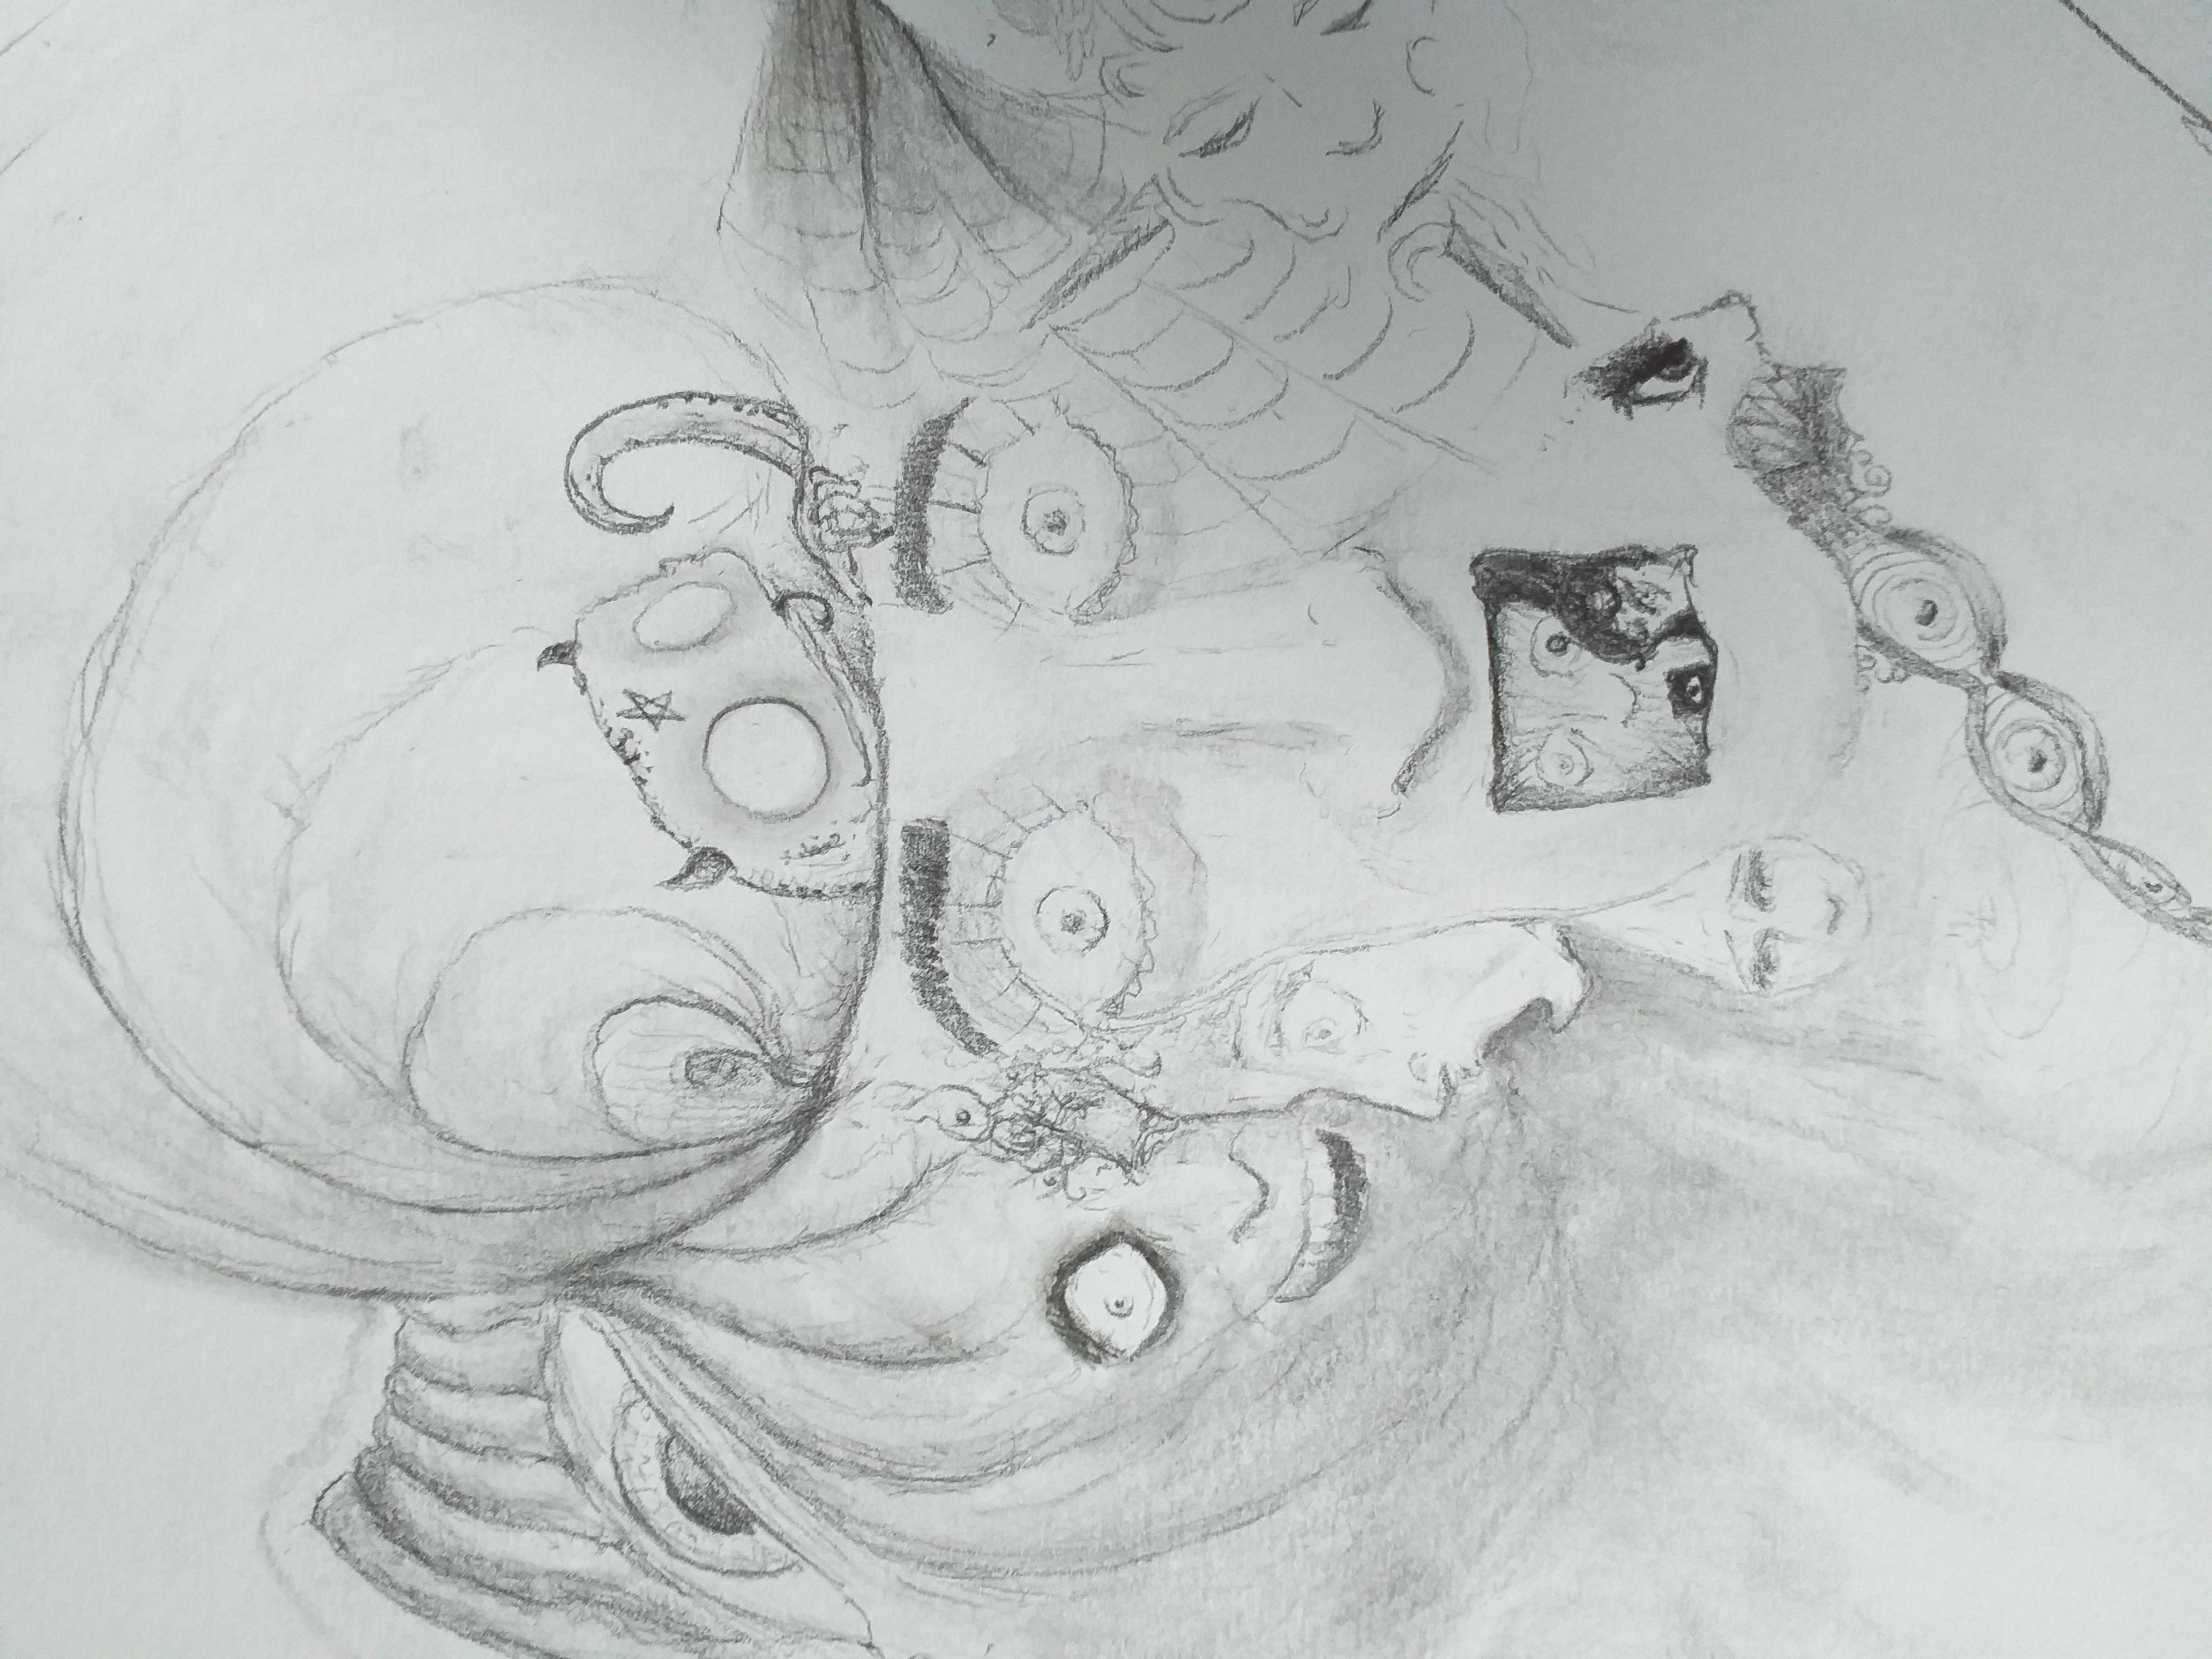 Fantasmagorie dessin graphite  cours de dessin